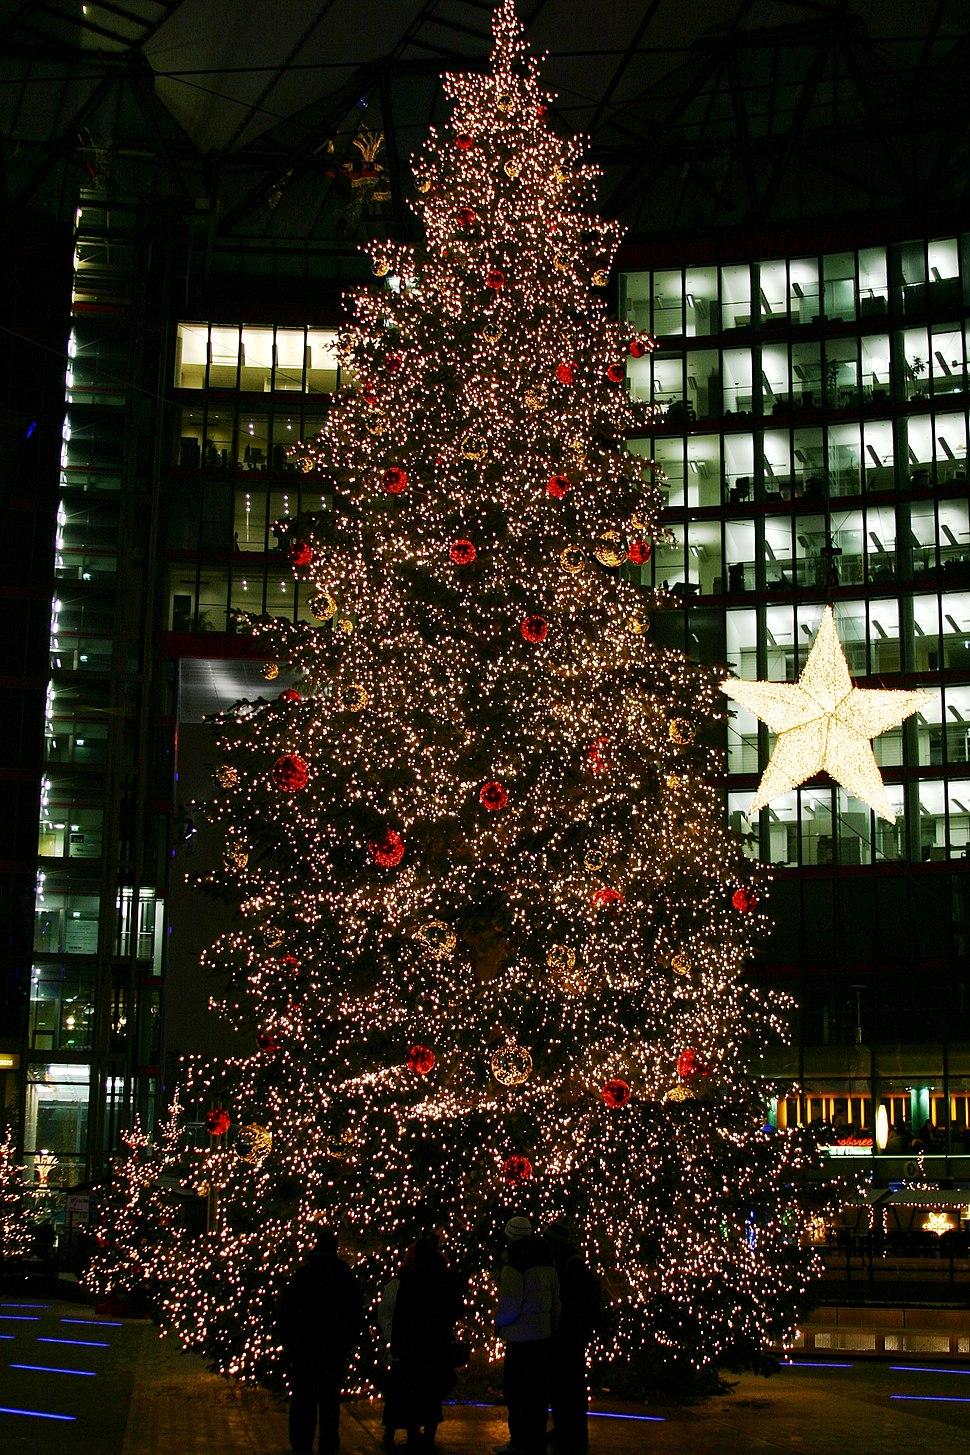 Christmas tree on the Potsdamer Platz (Sony Center) in Berlin, Germany